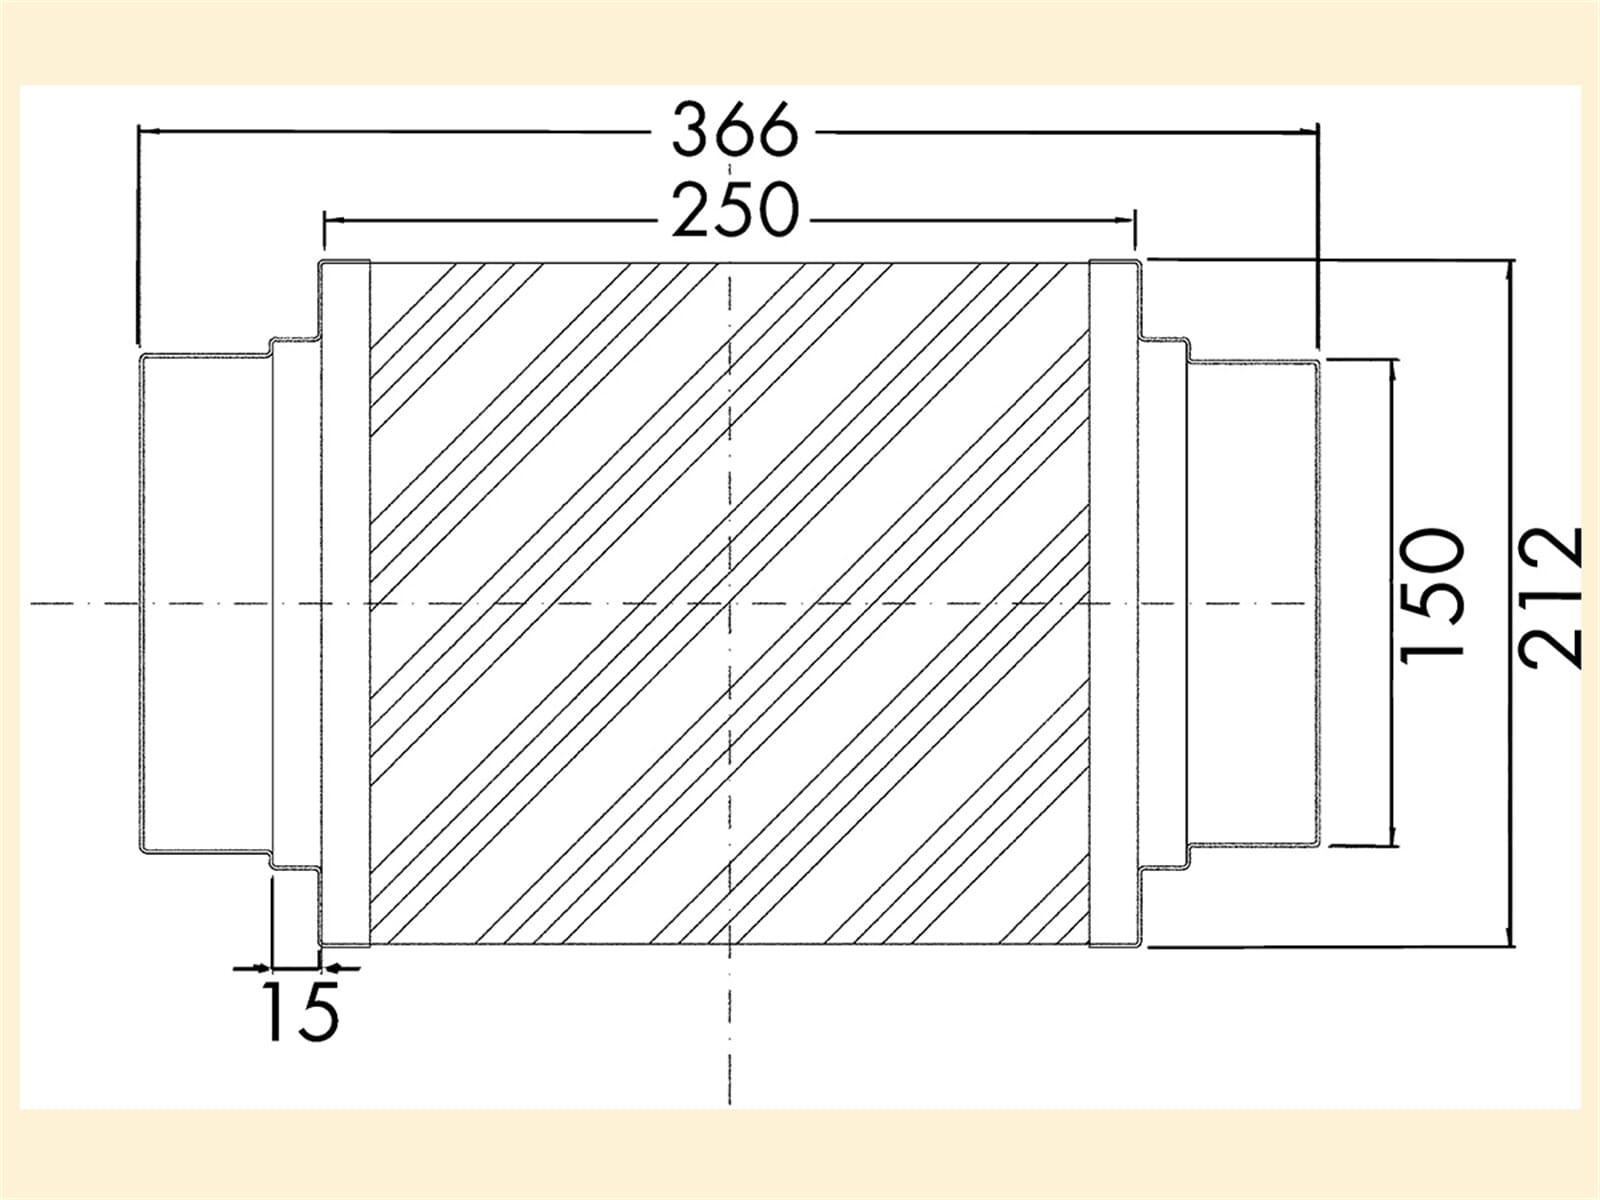 Compair 404.3.029 Schalldämpfer Aluminium 150